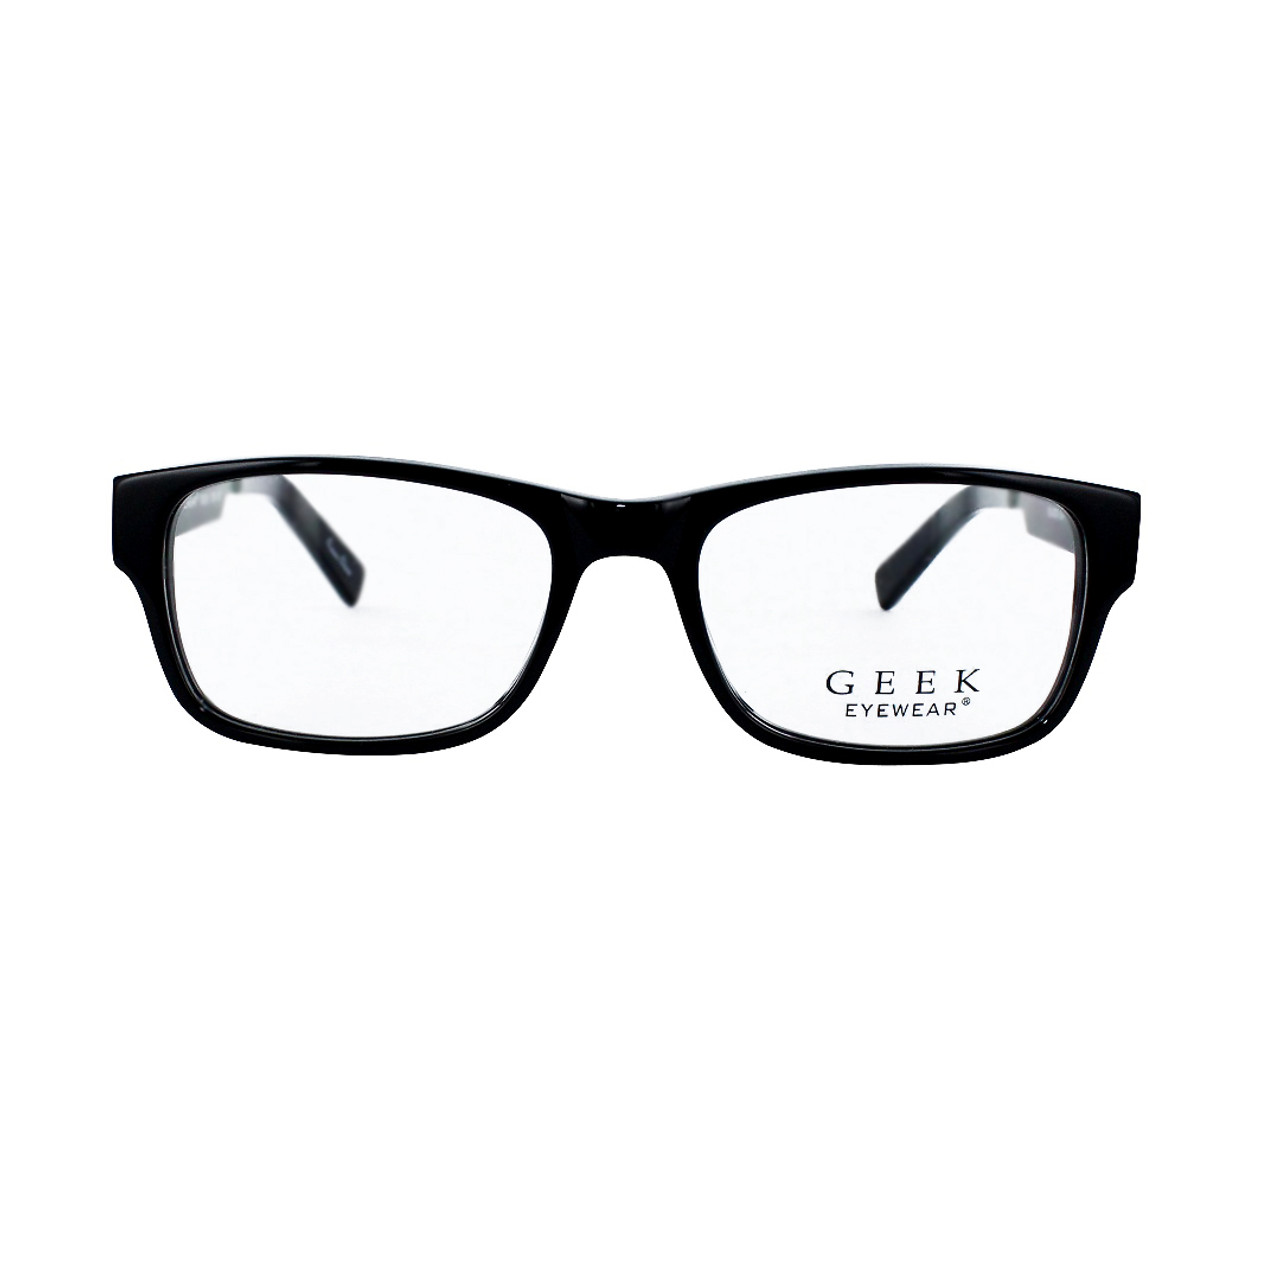 GEEK Eyewear GEEK 129